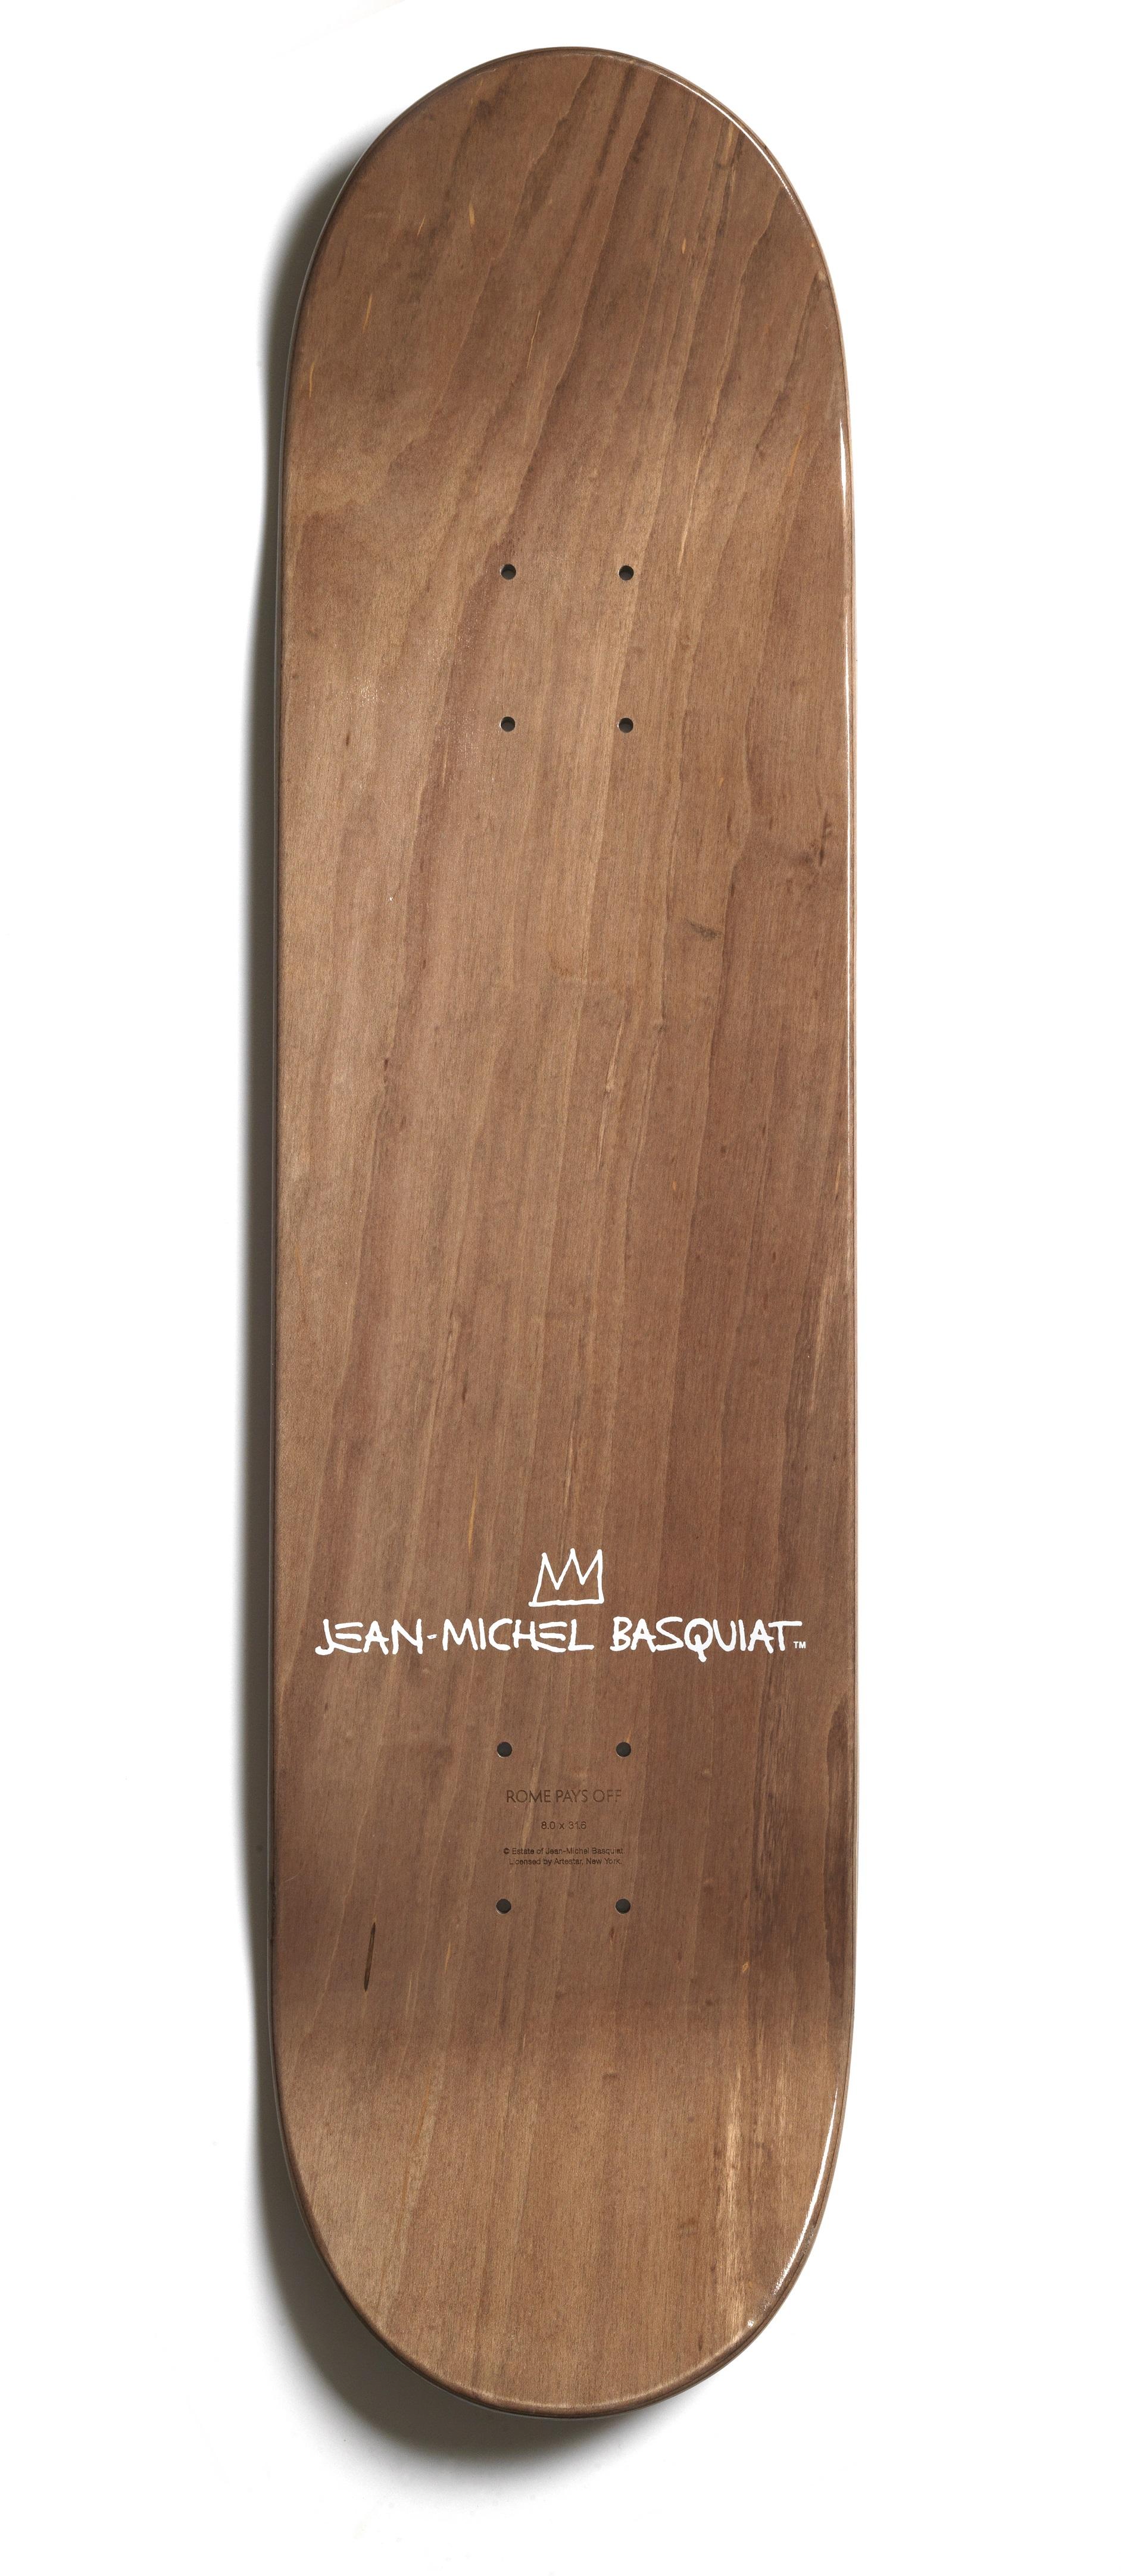 BASQUIAT - BOONE MONA LISA SKATEBOARD - £150 - IMAGE 1 - BROWNS FASHION.jpg